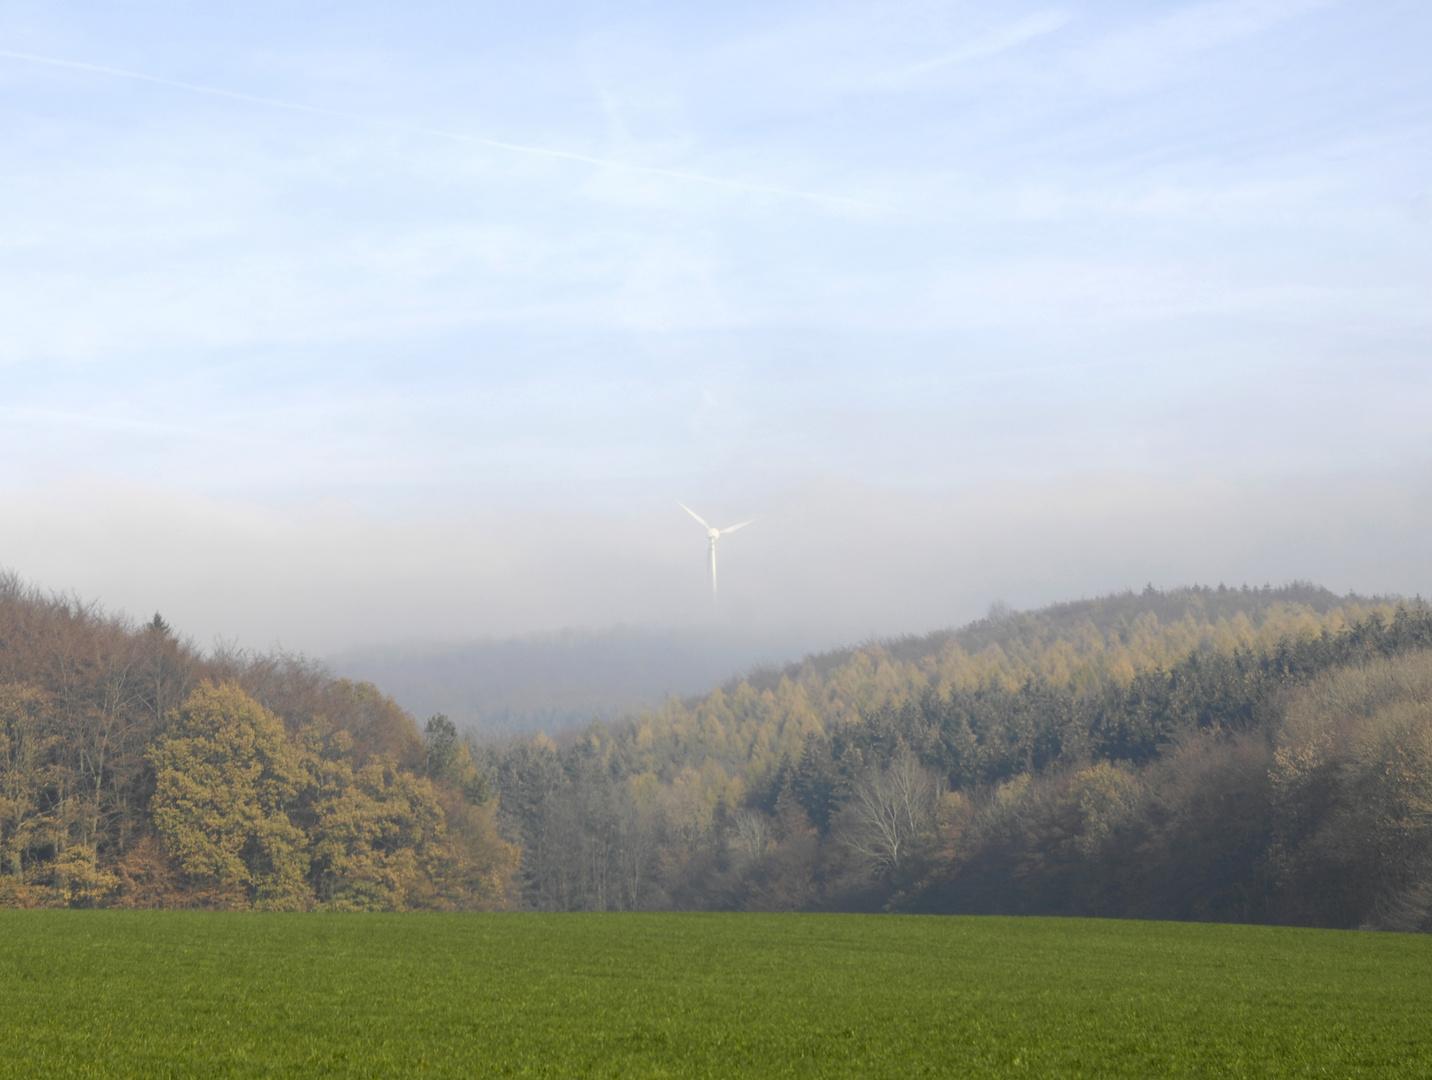 Windrad im Herbstnebel